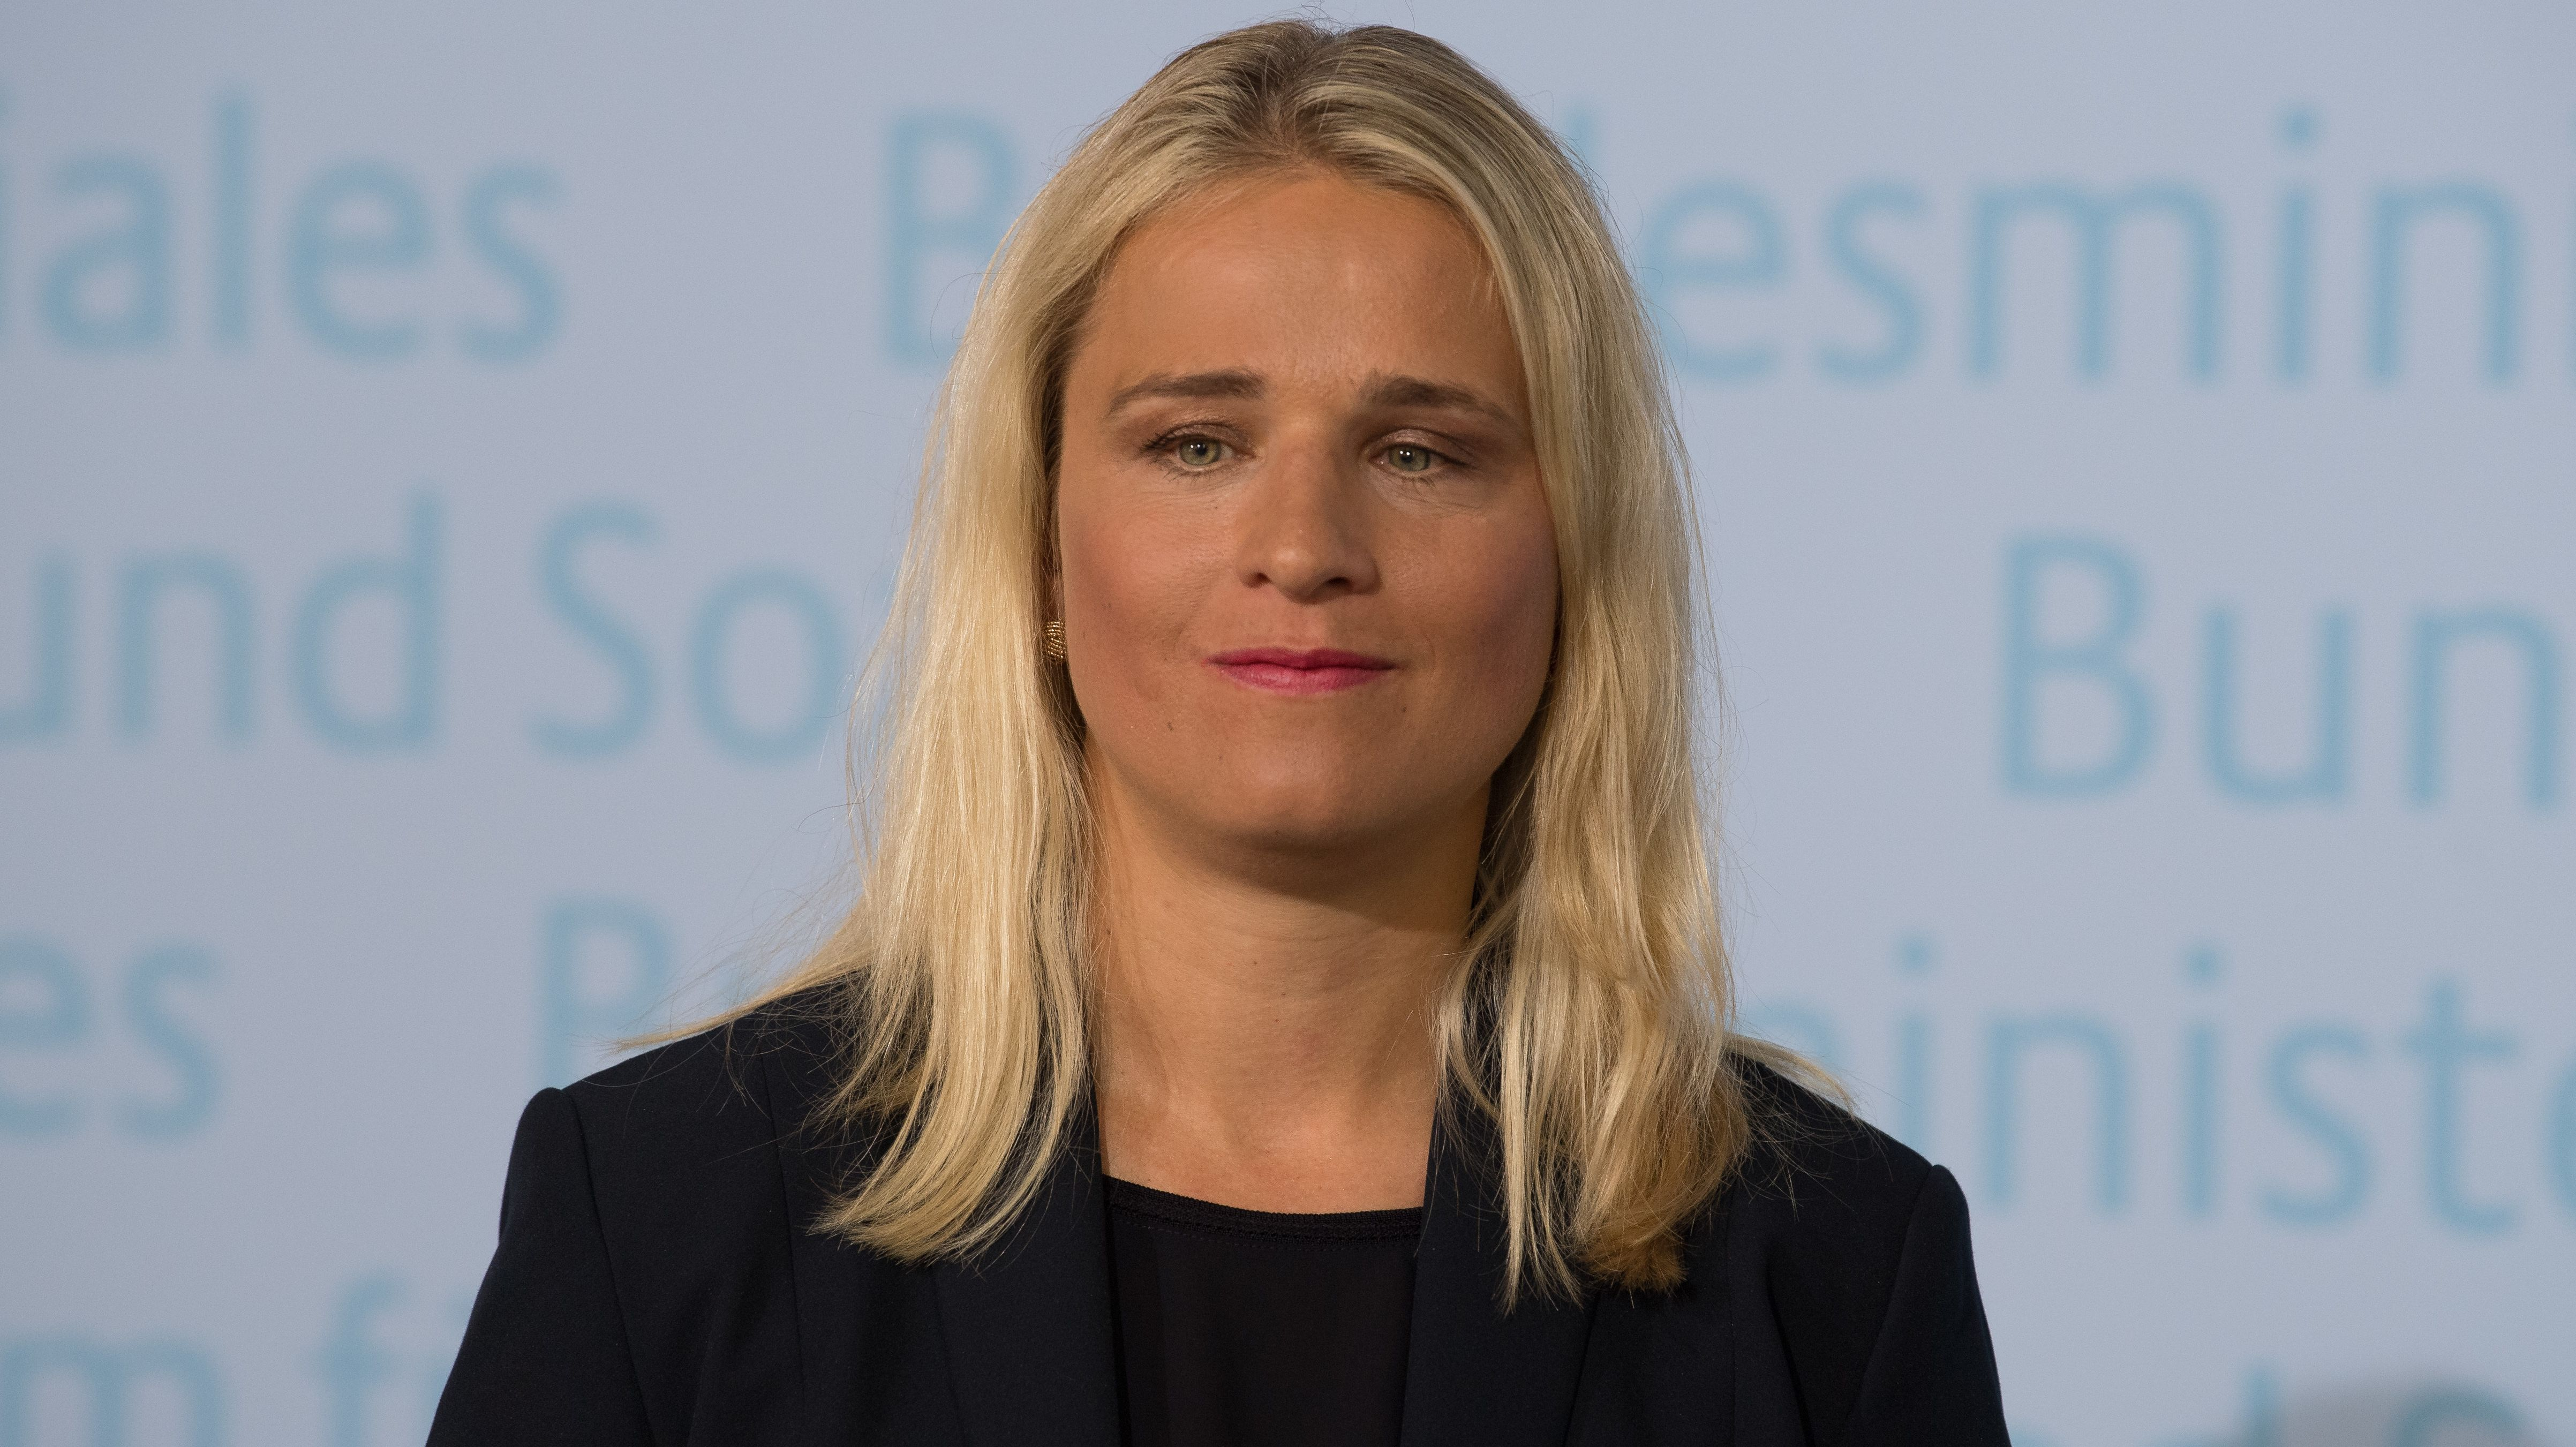 Verena Bentele, Präsidentin des Sozialverbands VdK